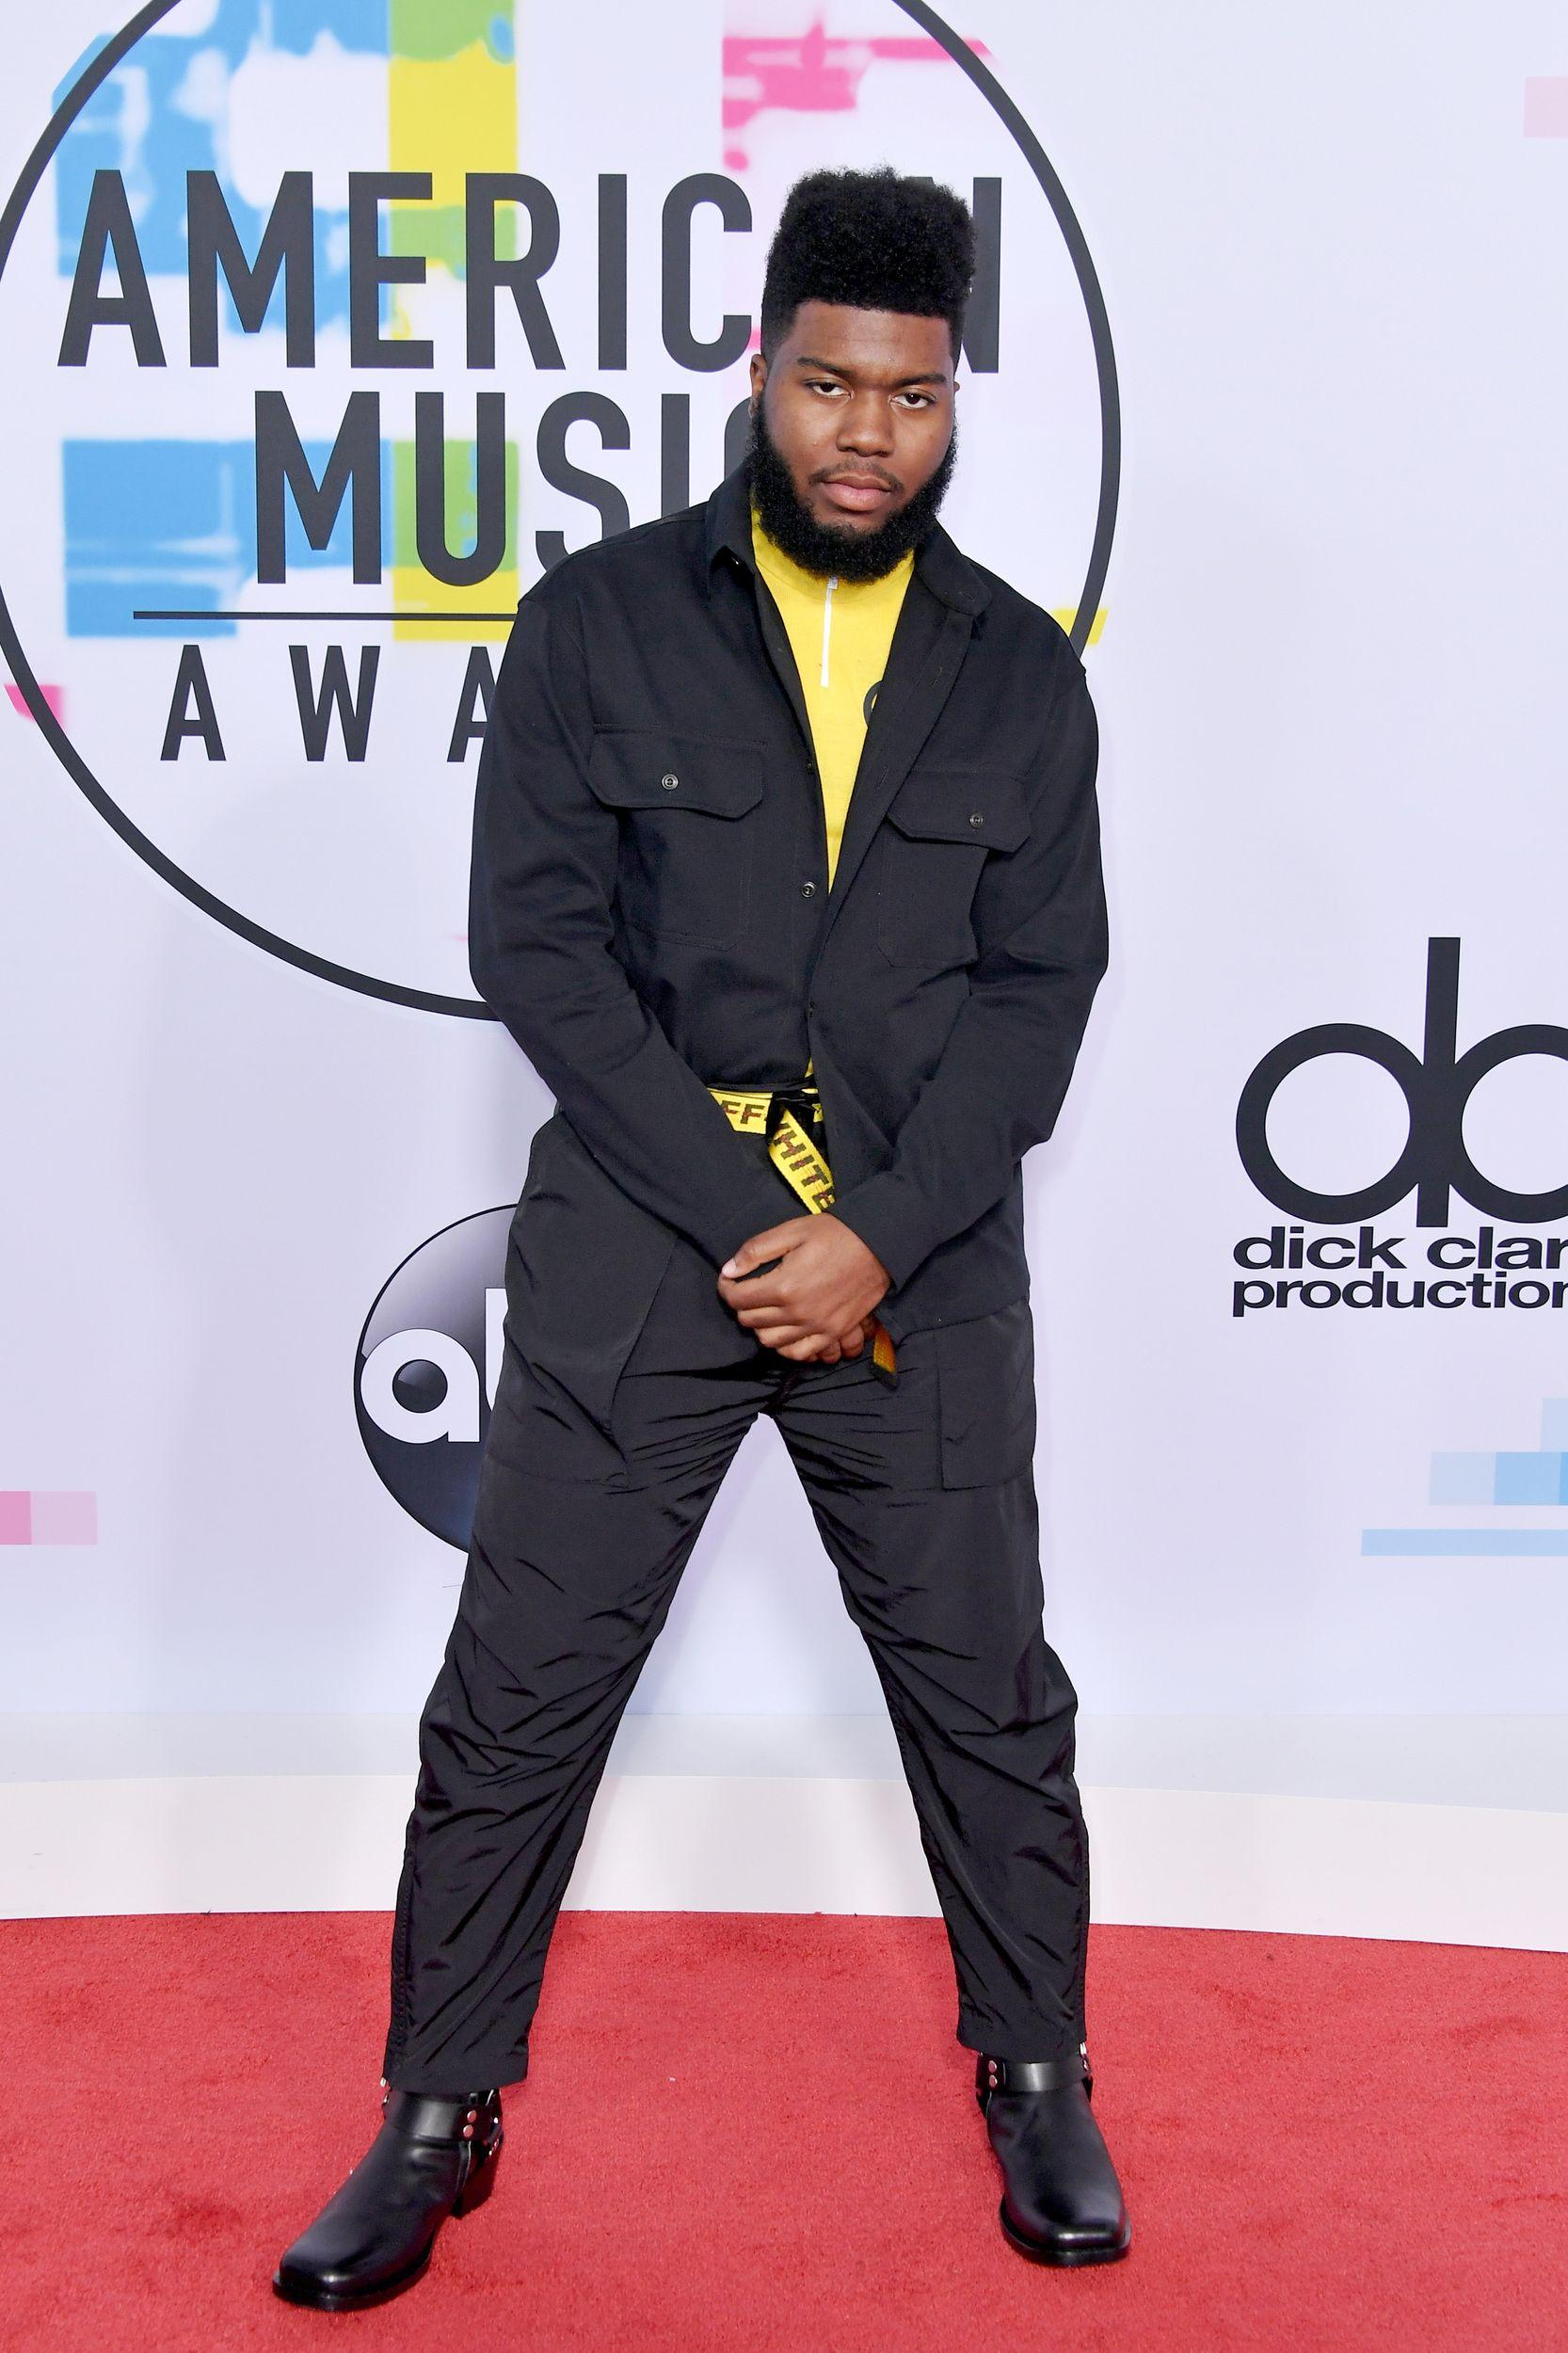 american music awards 2020 winners